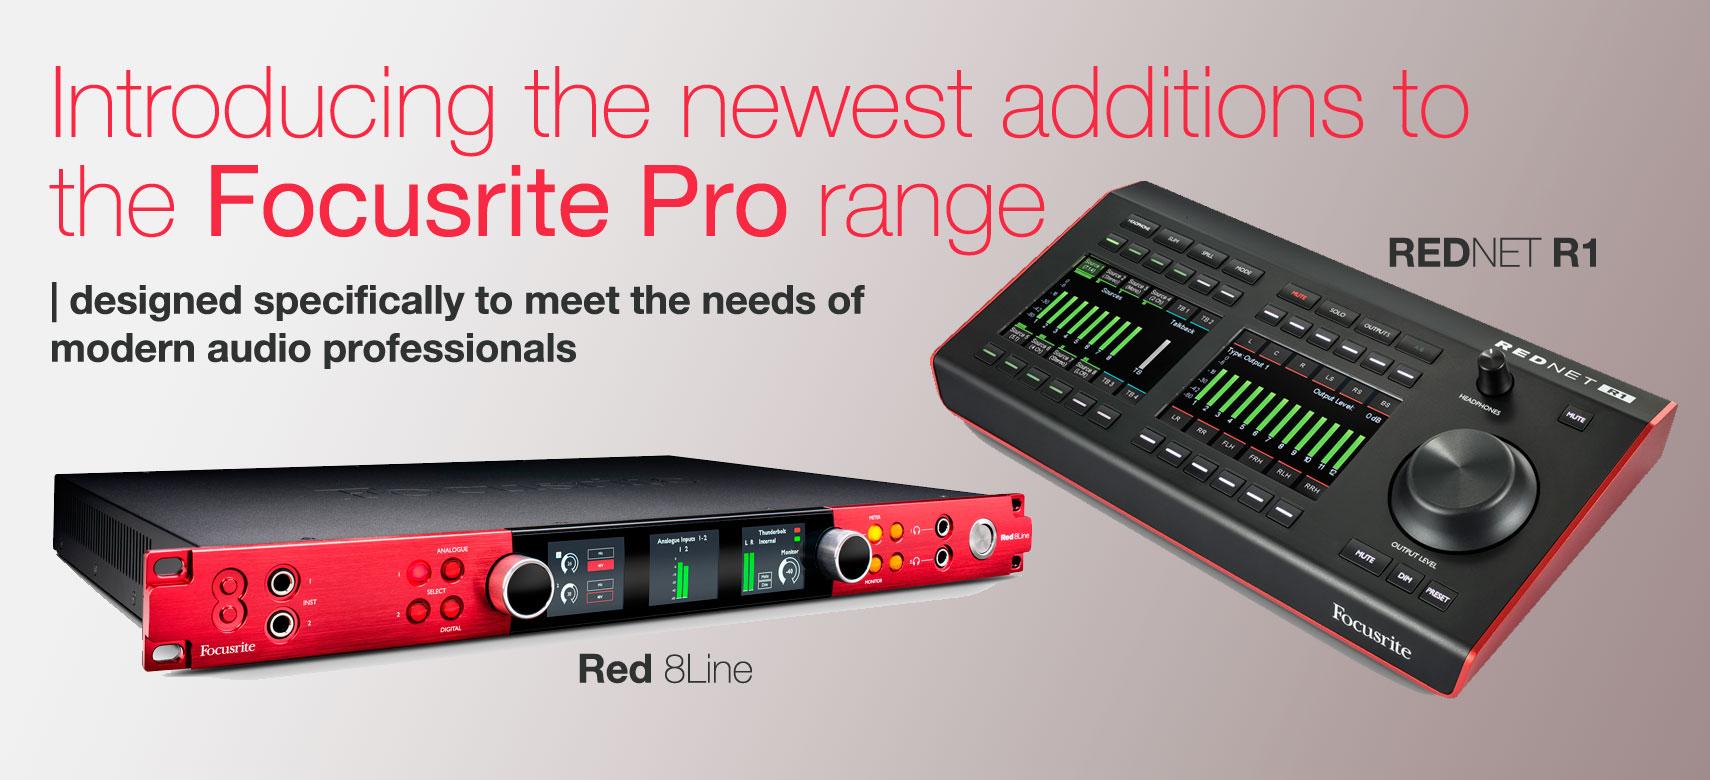 Focusrite Pro Red 8Line & R1